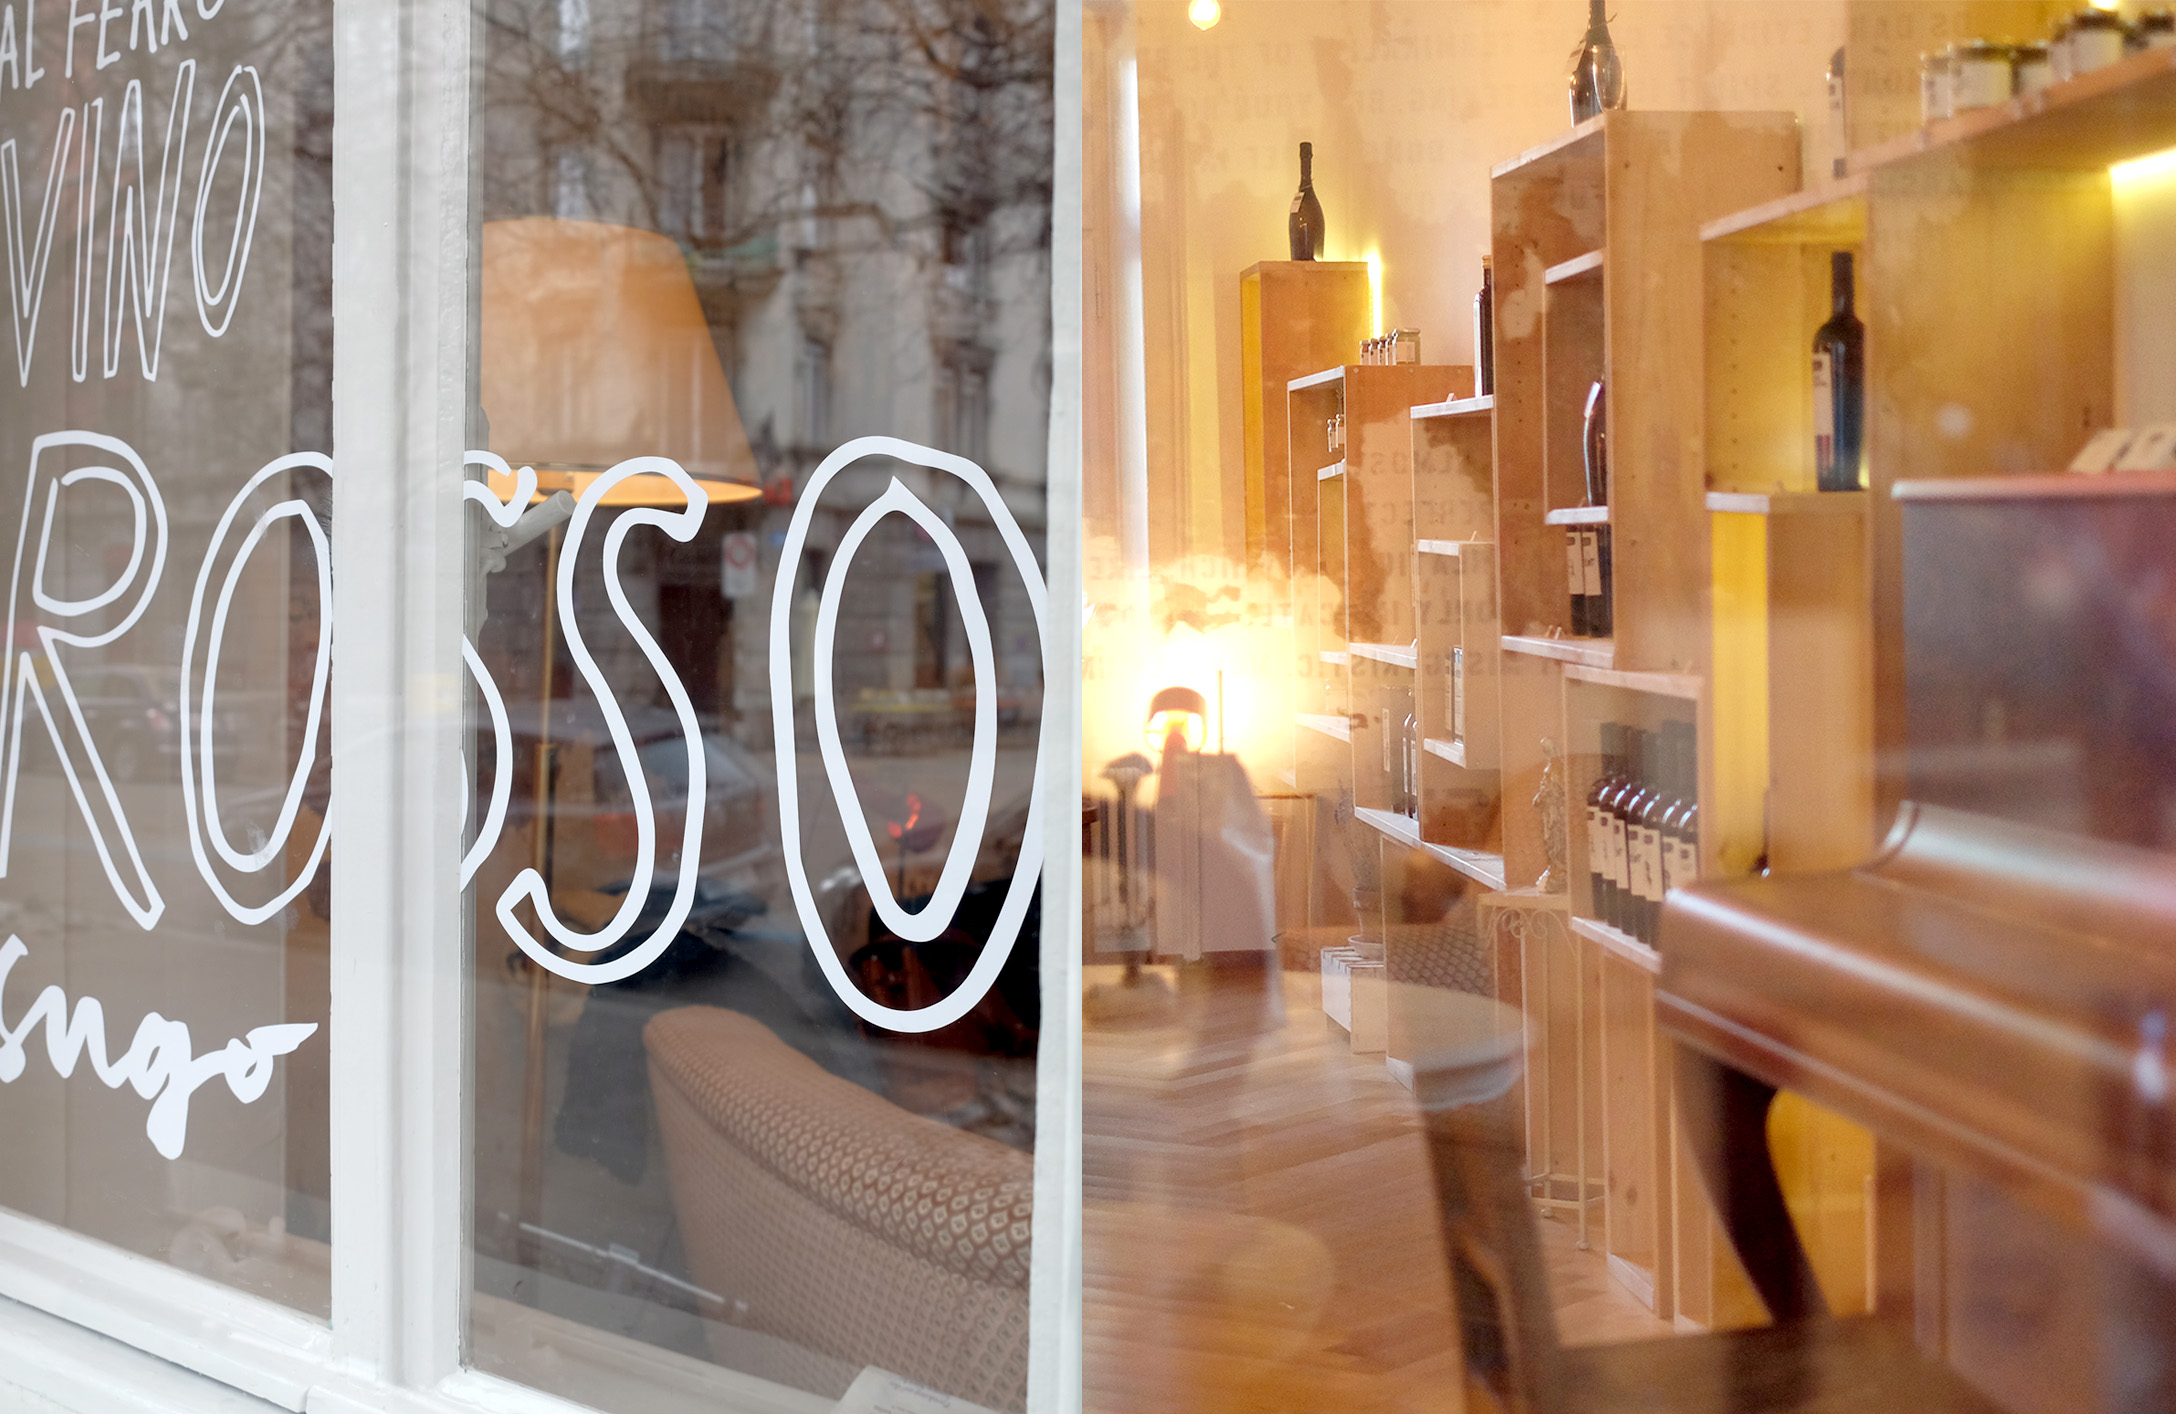 Simone Züger: Genovas – Fine Food and Beverage